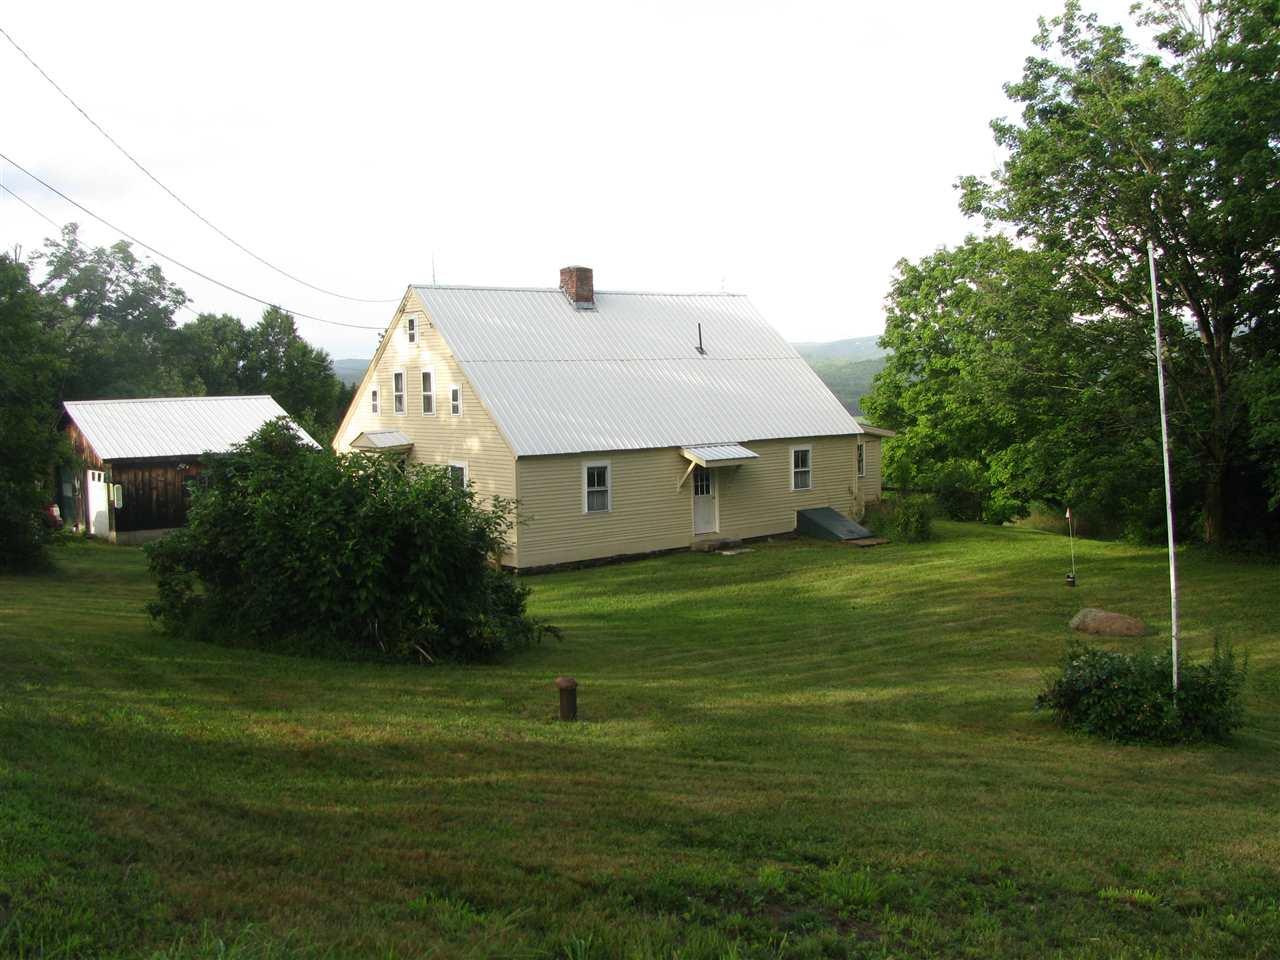 Westminster VTHorse Farm | Property